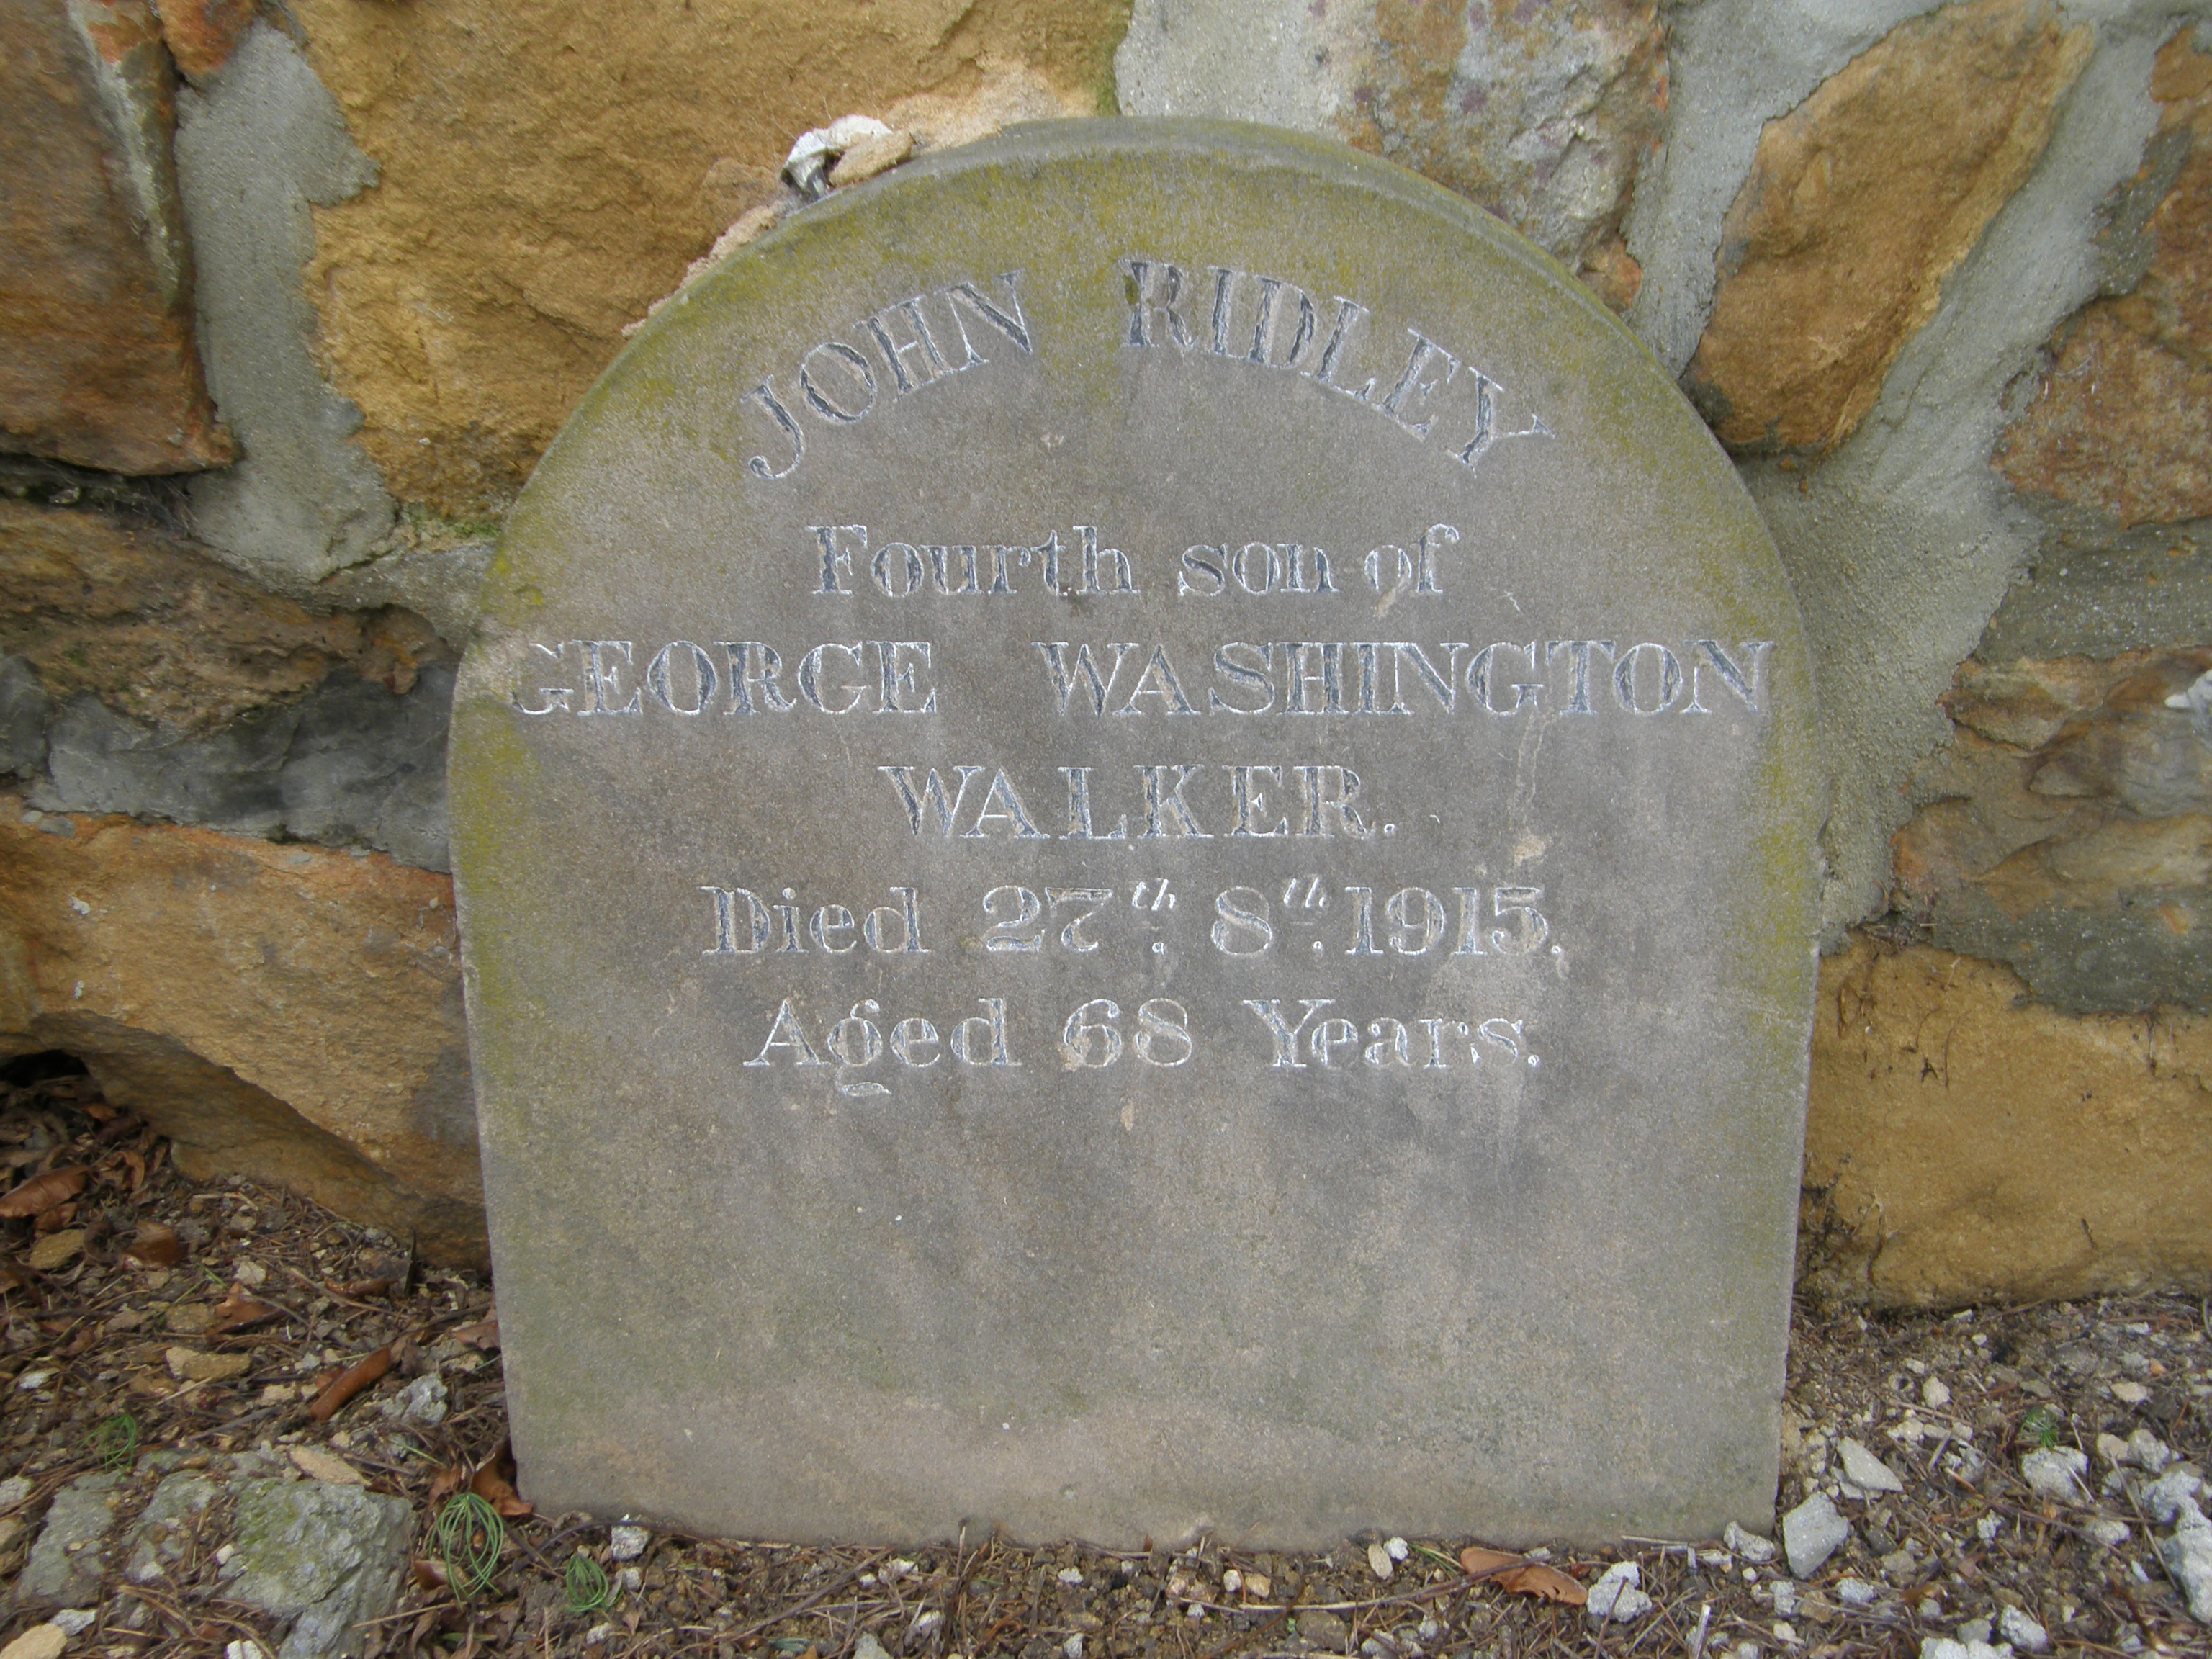 Photograph of gravestone of John Ridley Walker, West Hobart, Tasmania